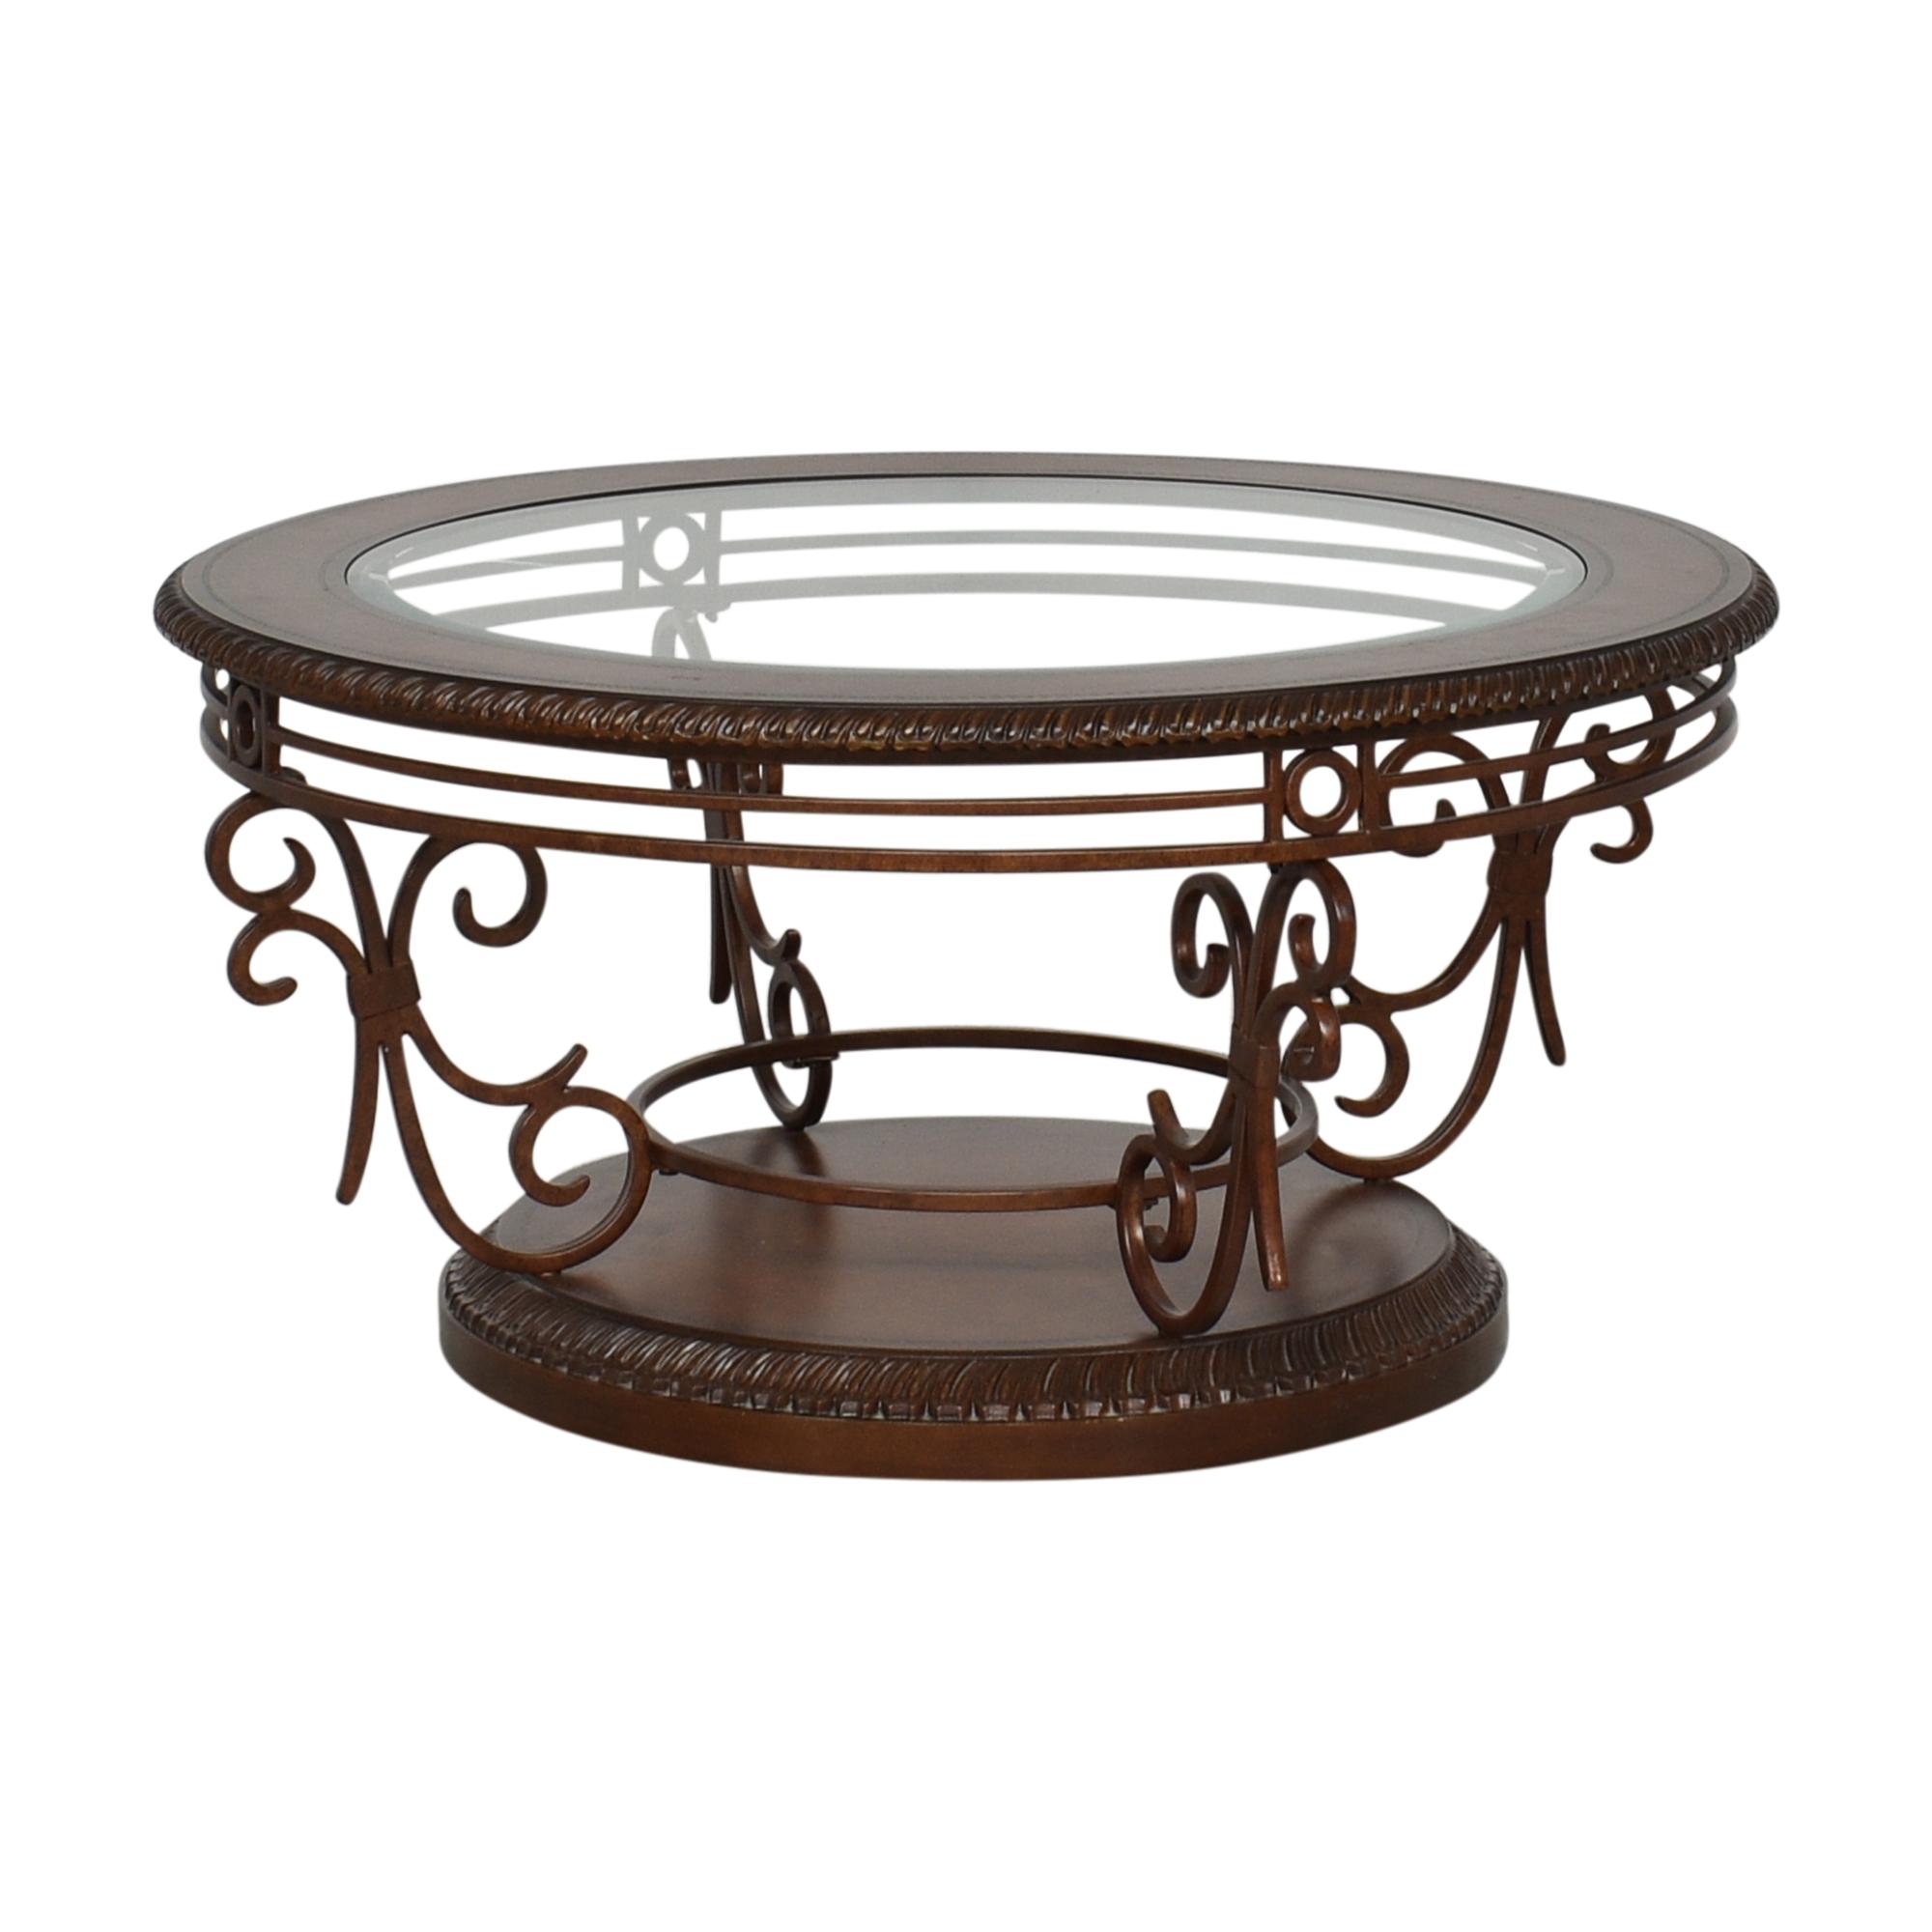 Decorative Round Coffee Table